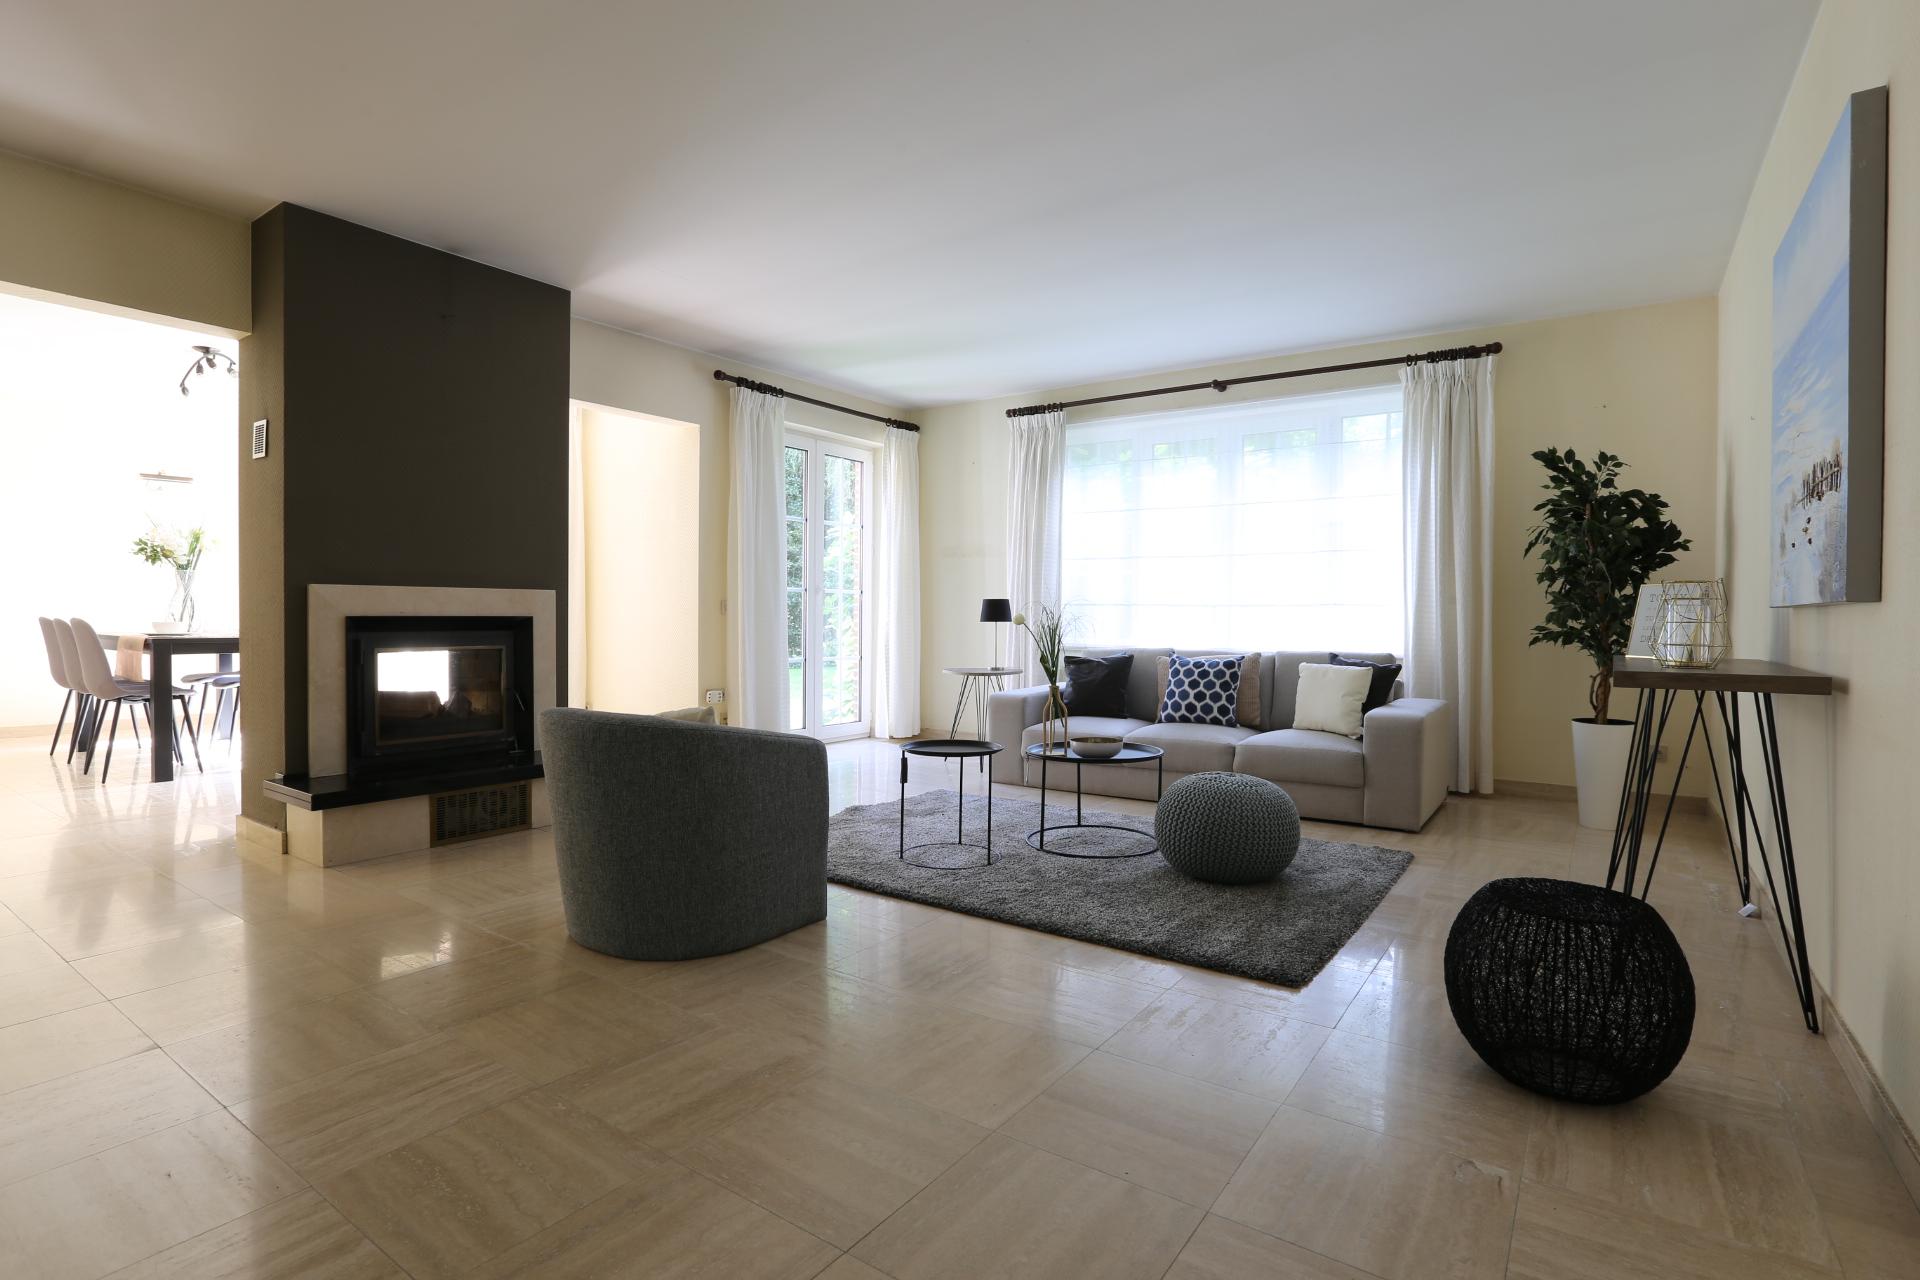 1 kamer woning inrichten gallery of betonnen slaapkamer for Woning inrichten app